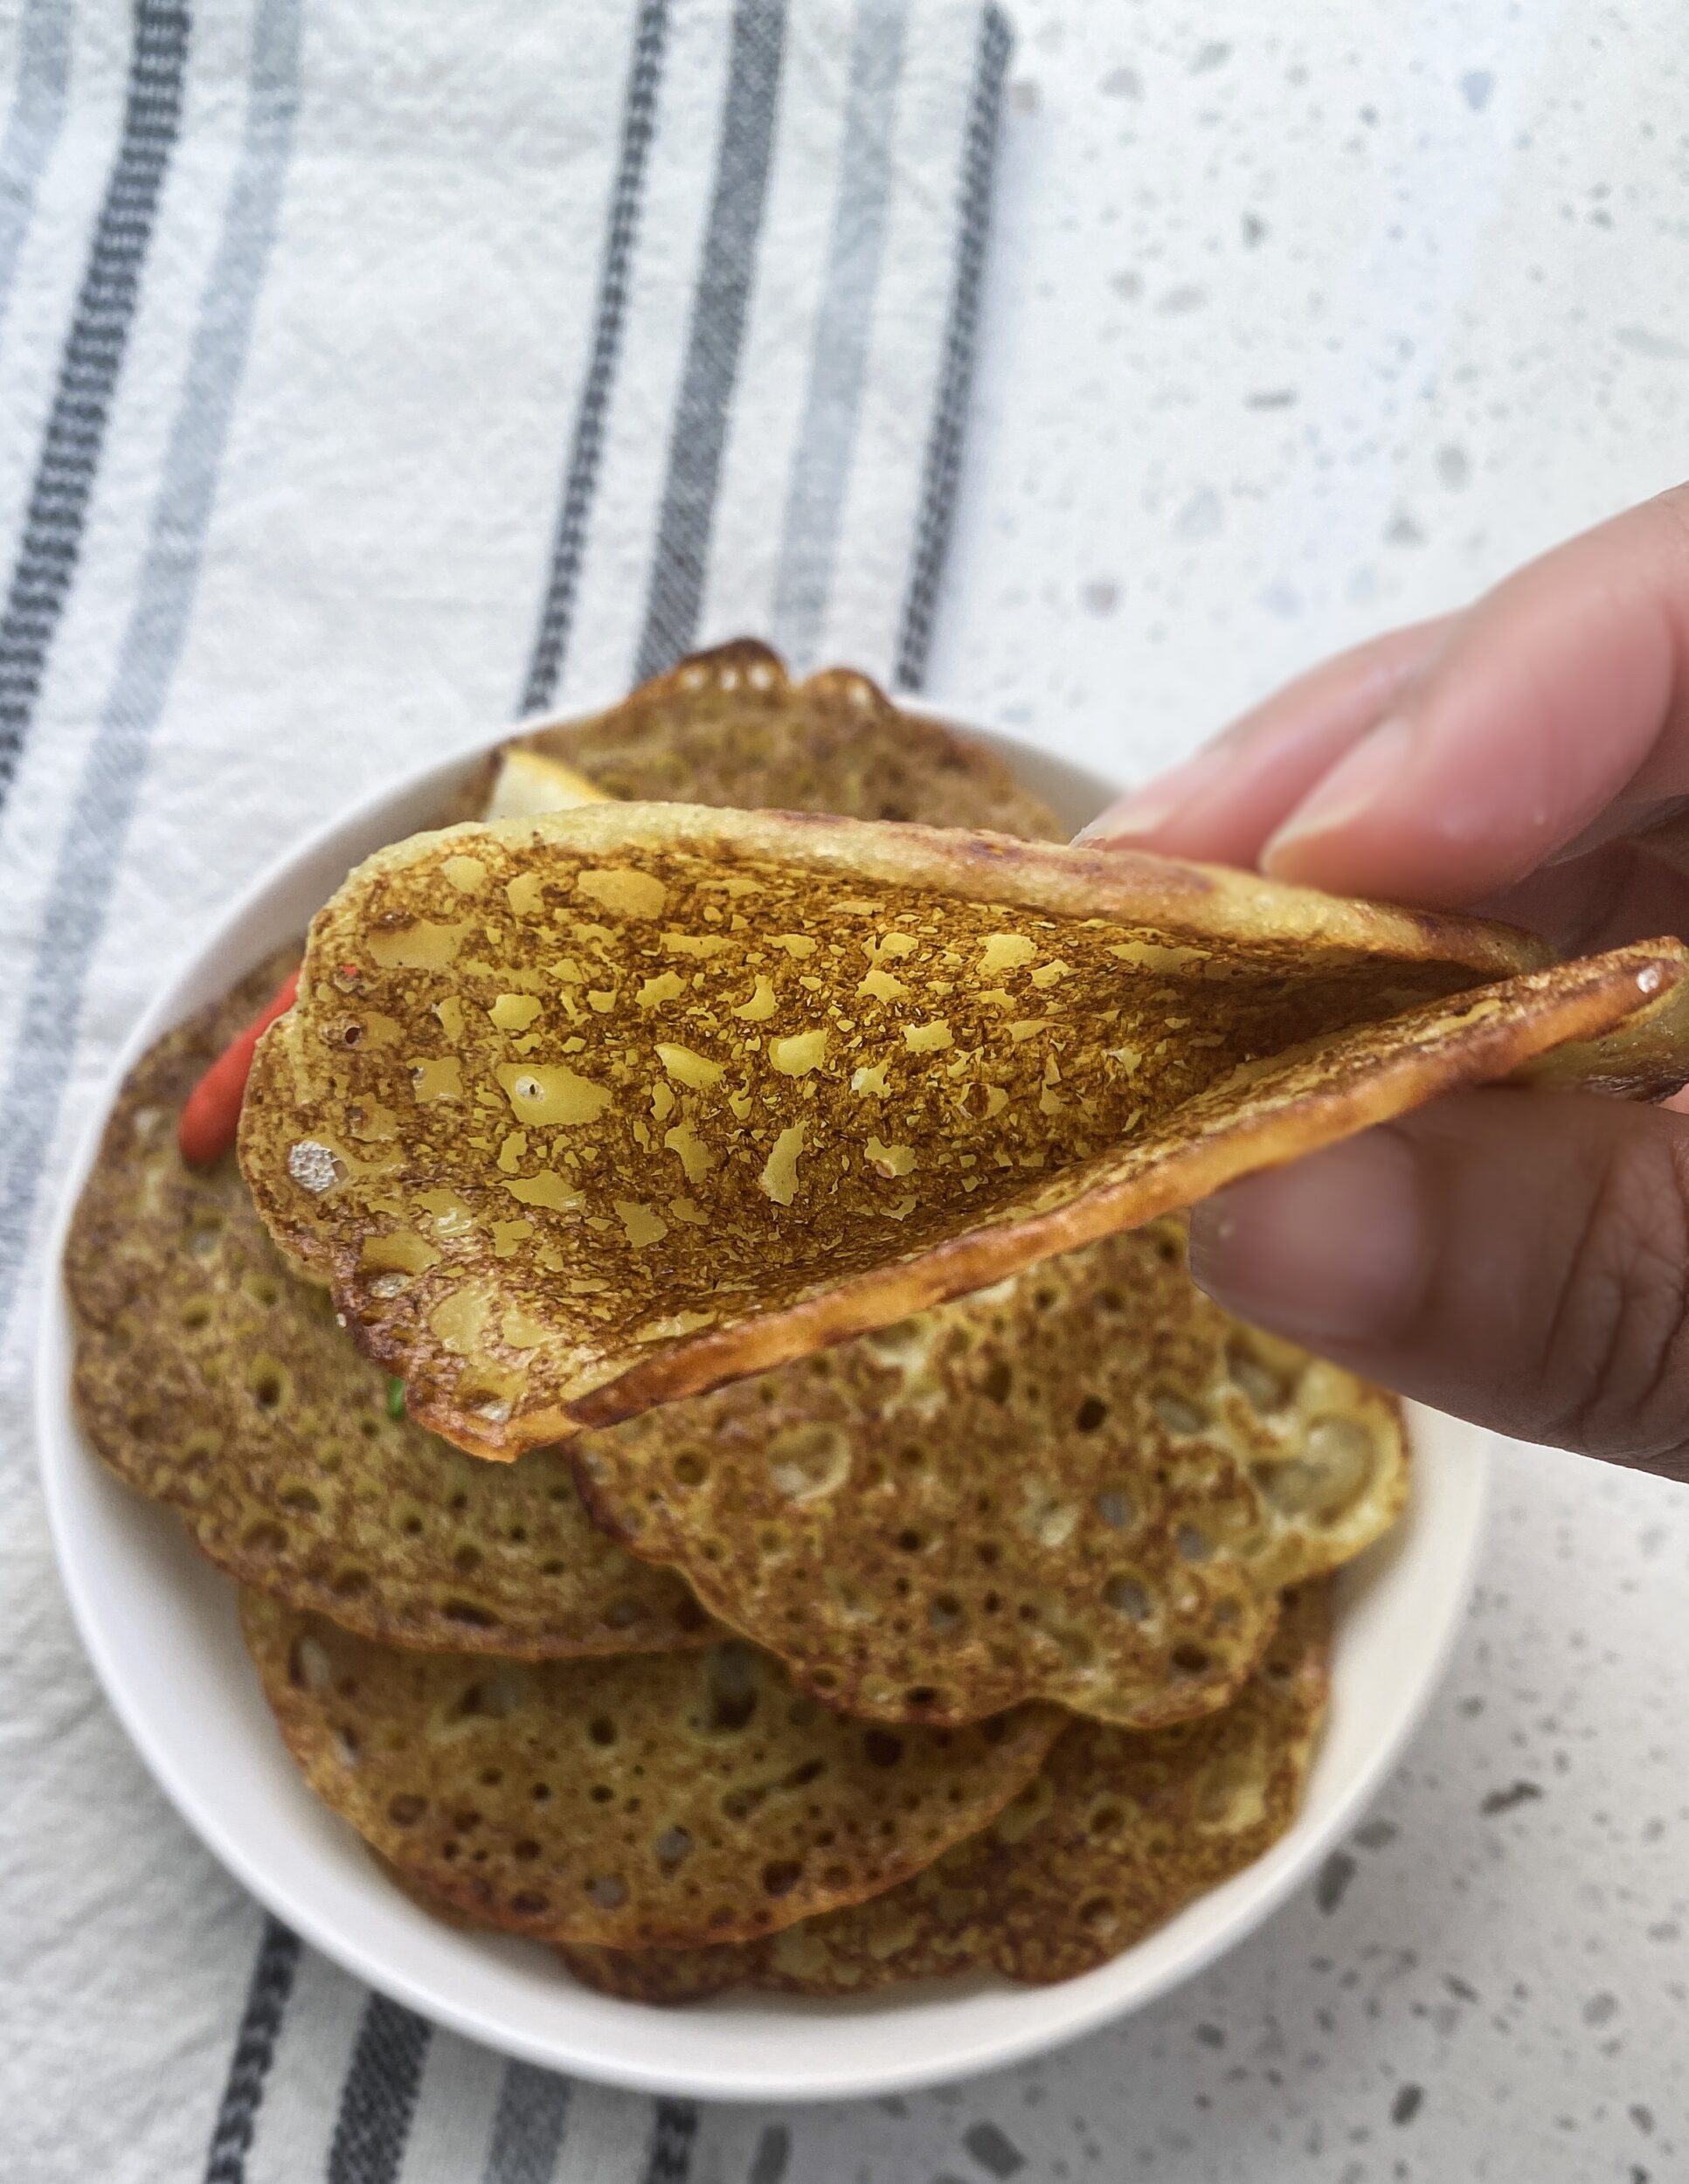 grandma's recipe for khatta puda folded in half to show crisp, thin, and soft texture